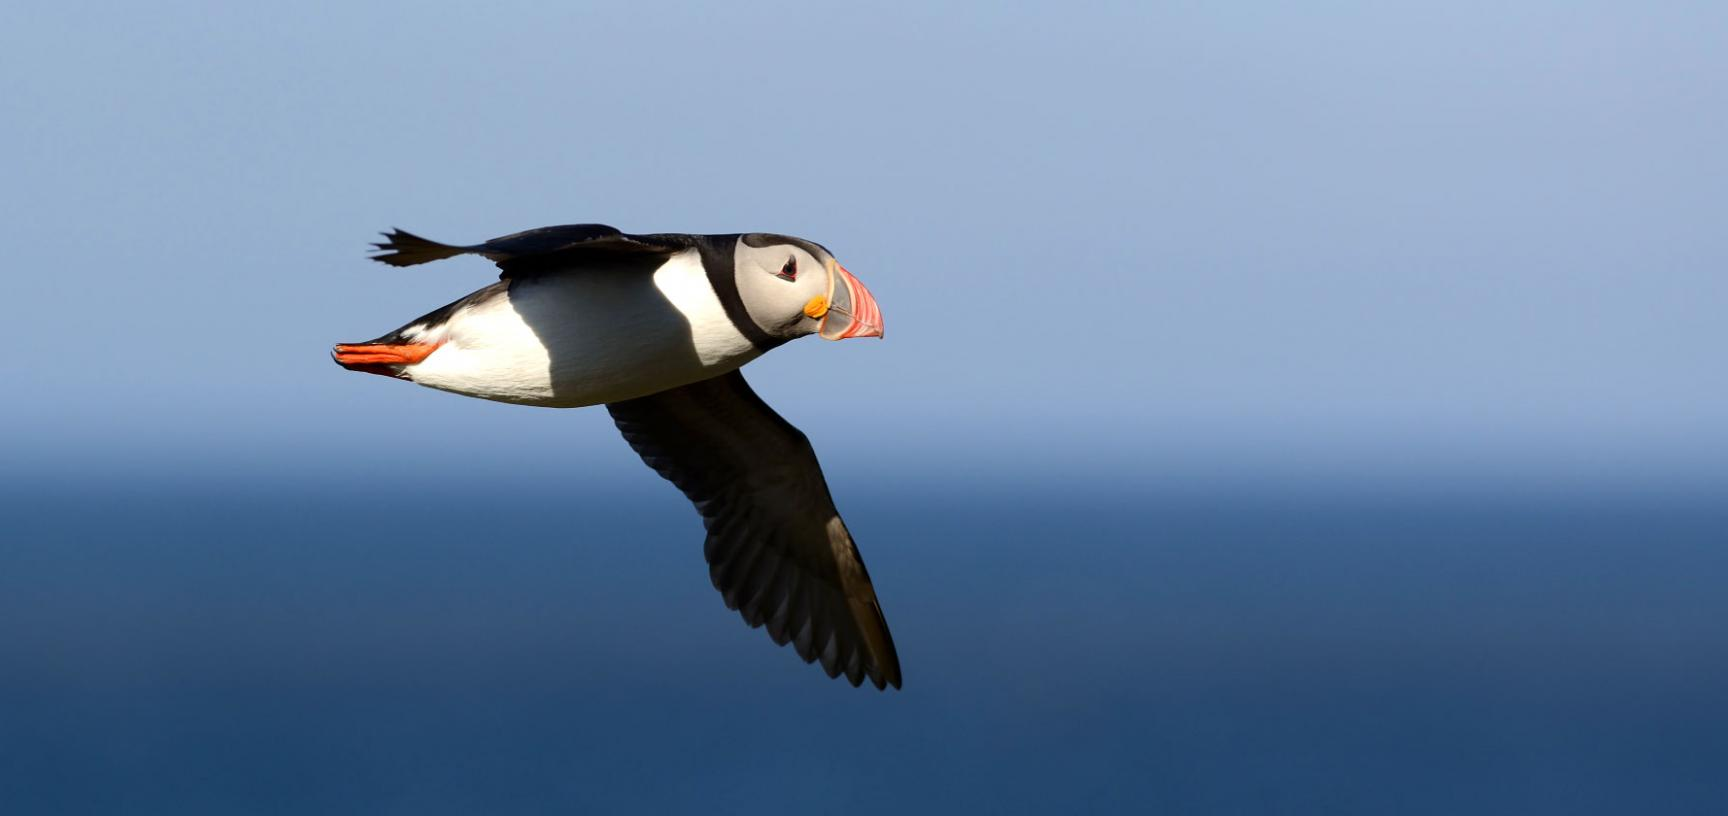 Puffin in flight in the Norwegian Sea (credit: Tycho Anker Nilssen)